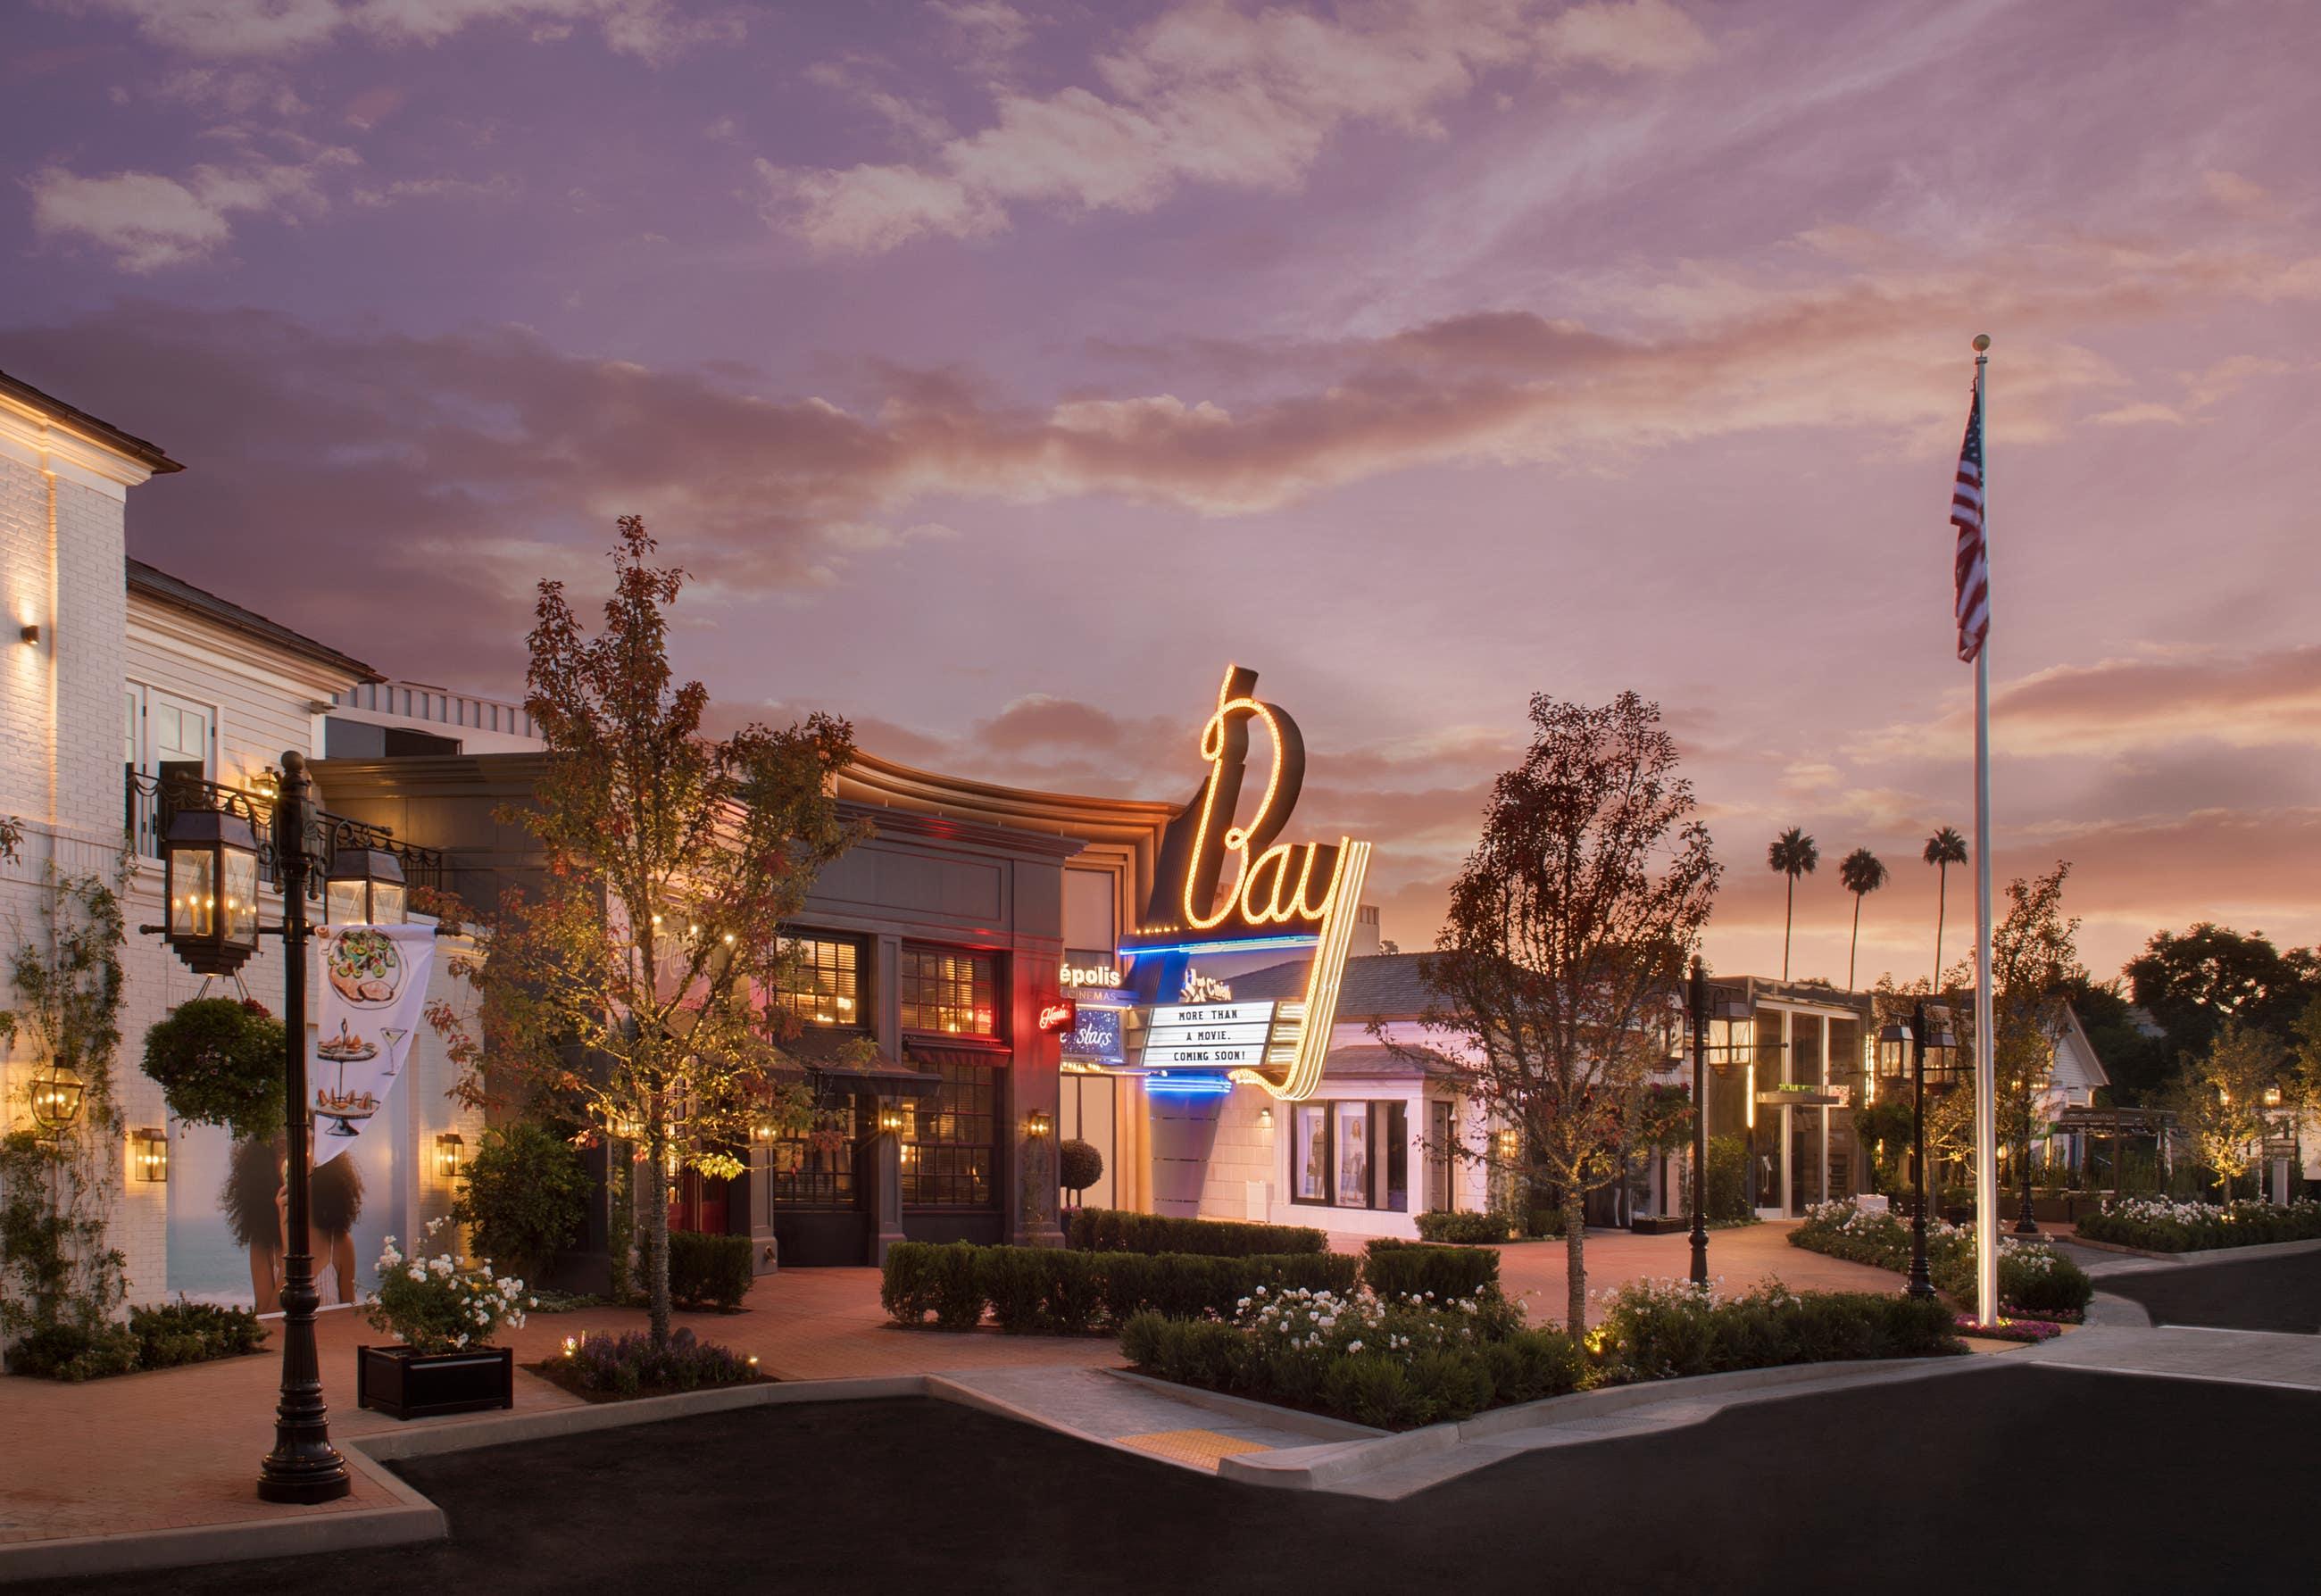 The Bay Theatre by Cinépolis Luxury Cinemas in Palisades Village